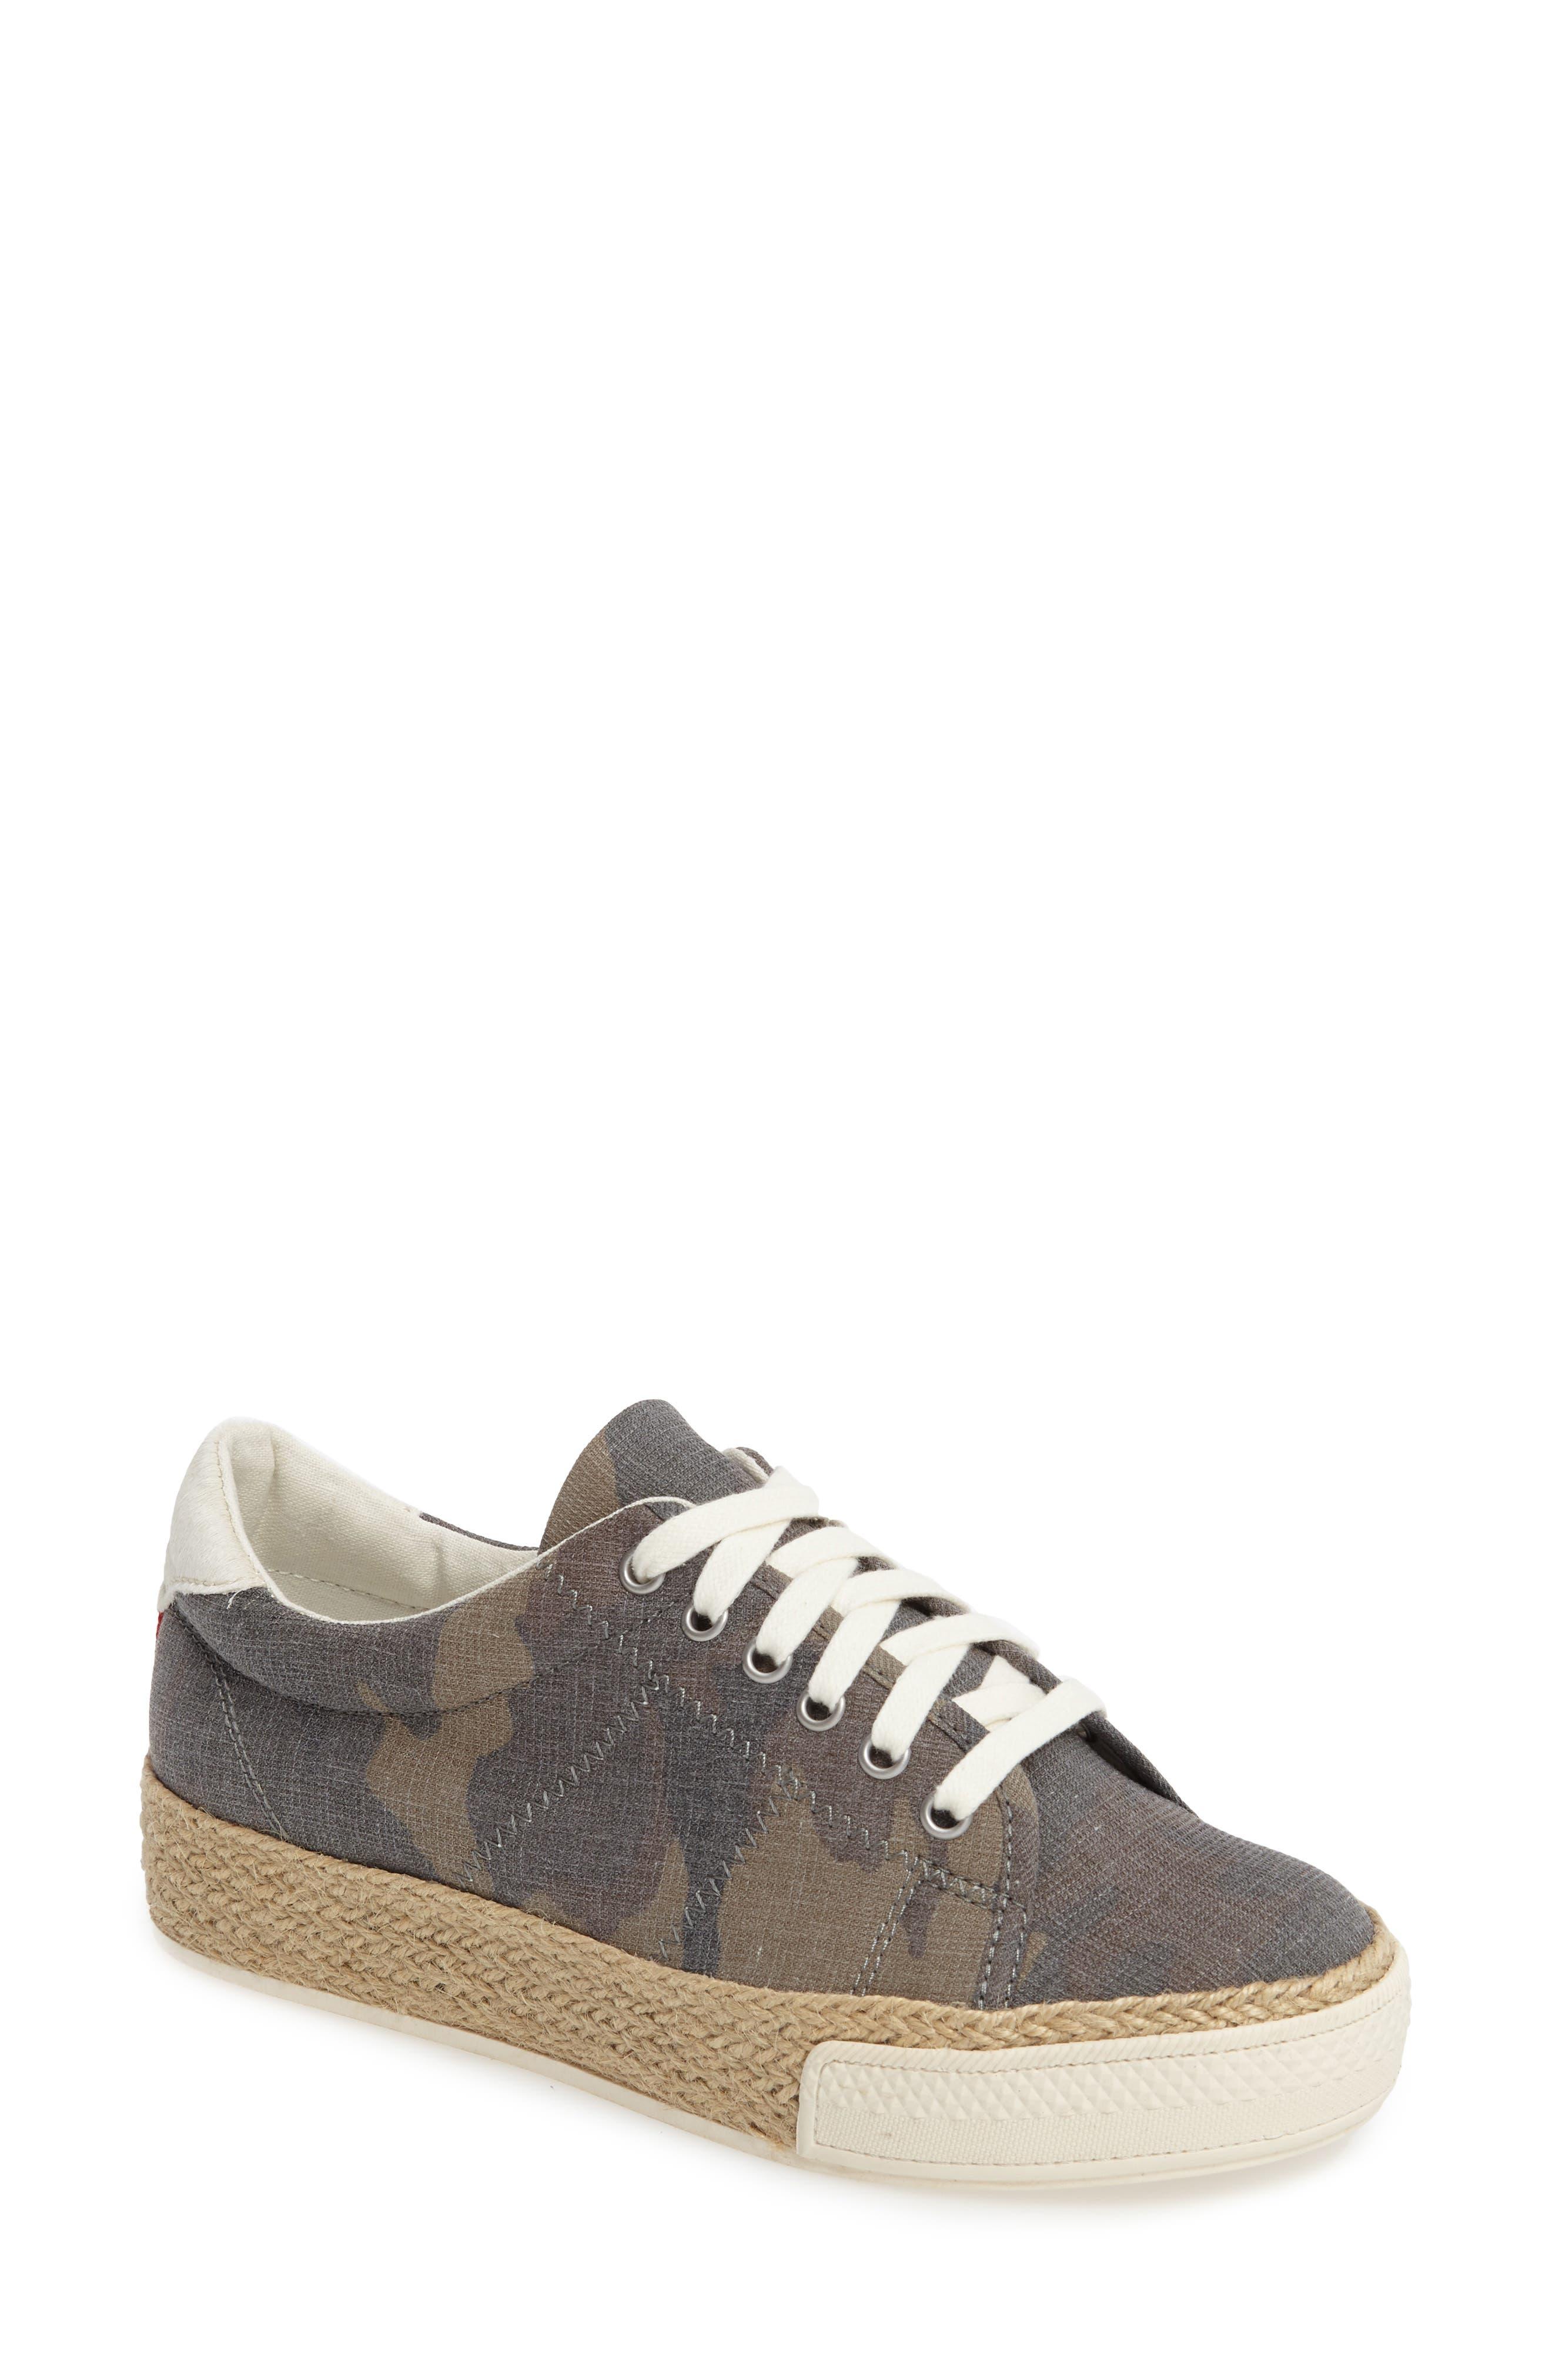 Alternate Image 1 Selected - Dolce Vita Tala Platform Sneaker (Women)